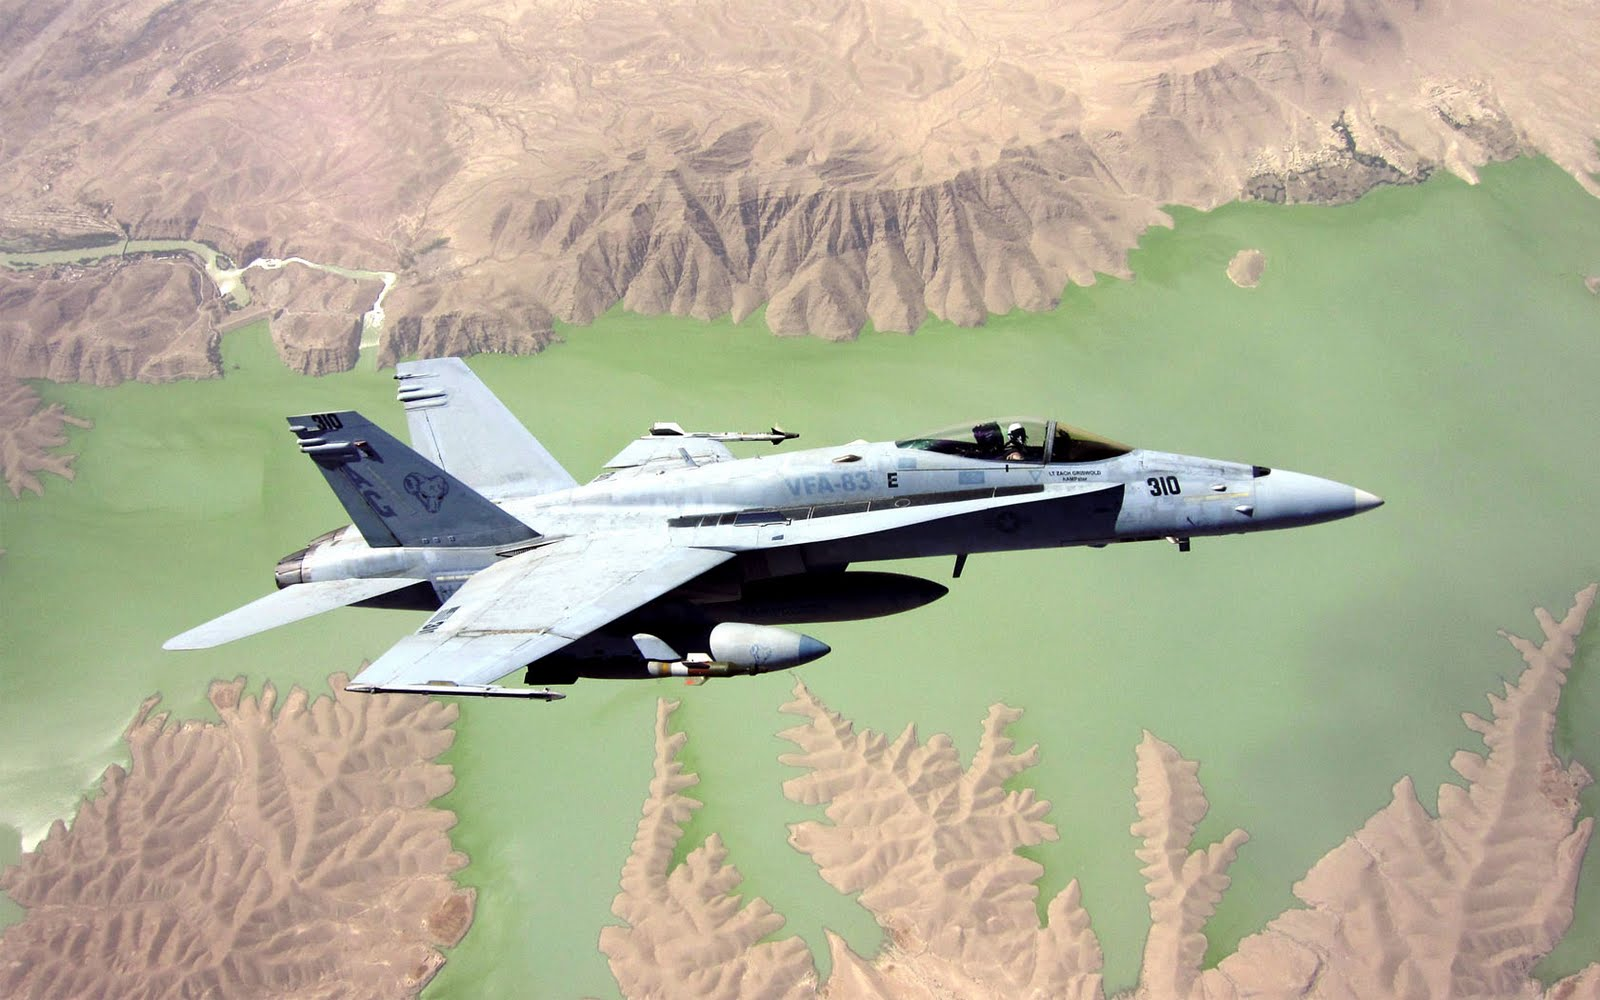 http://1.bp.blogspot.com/_8_4GnCTp578/TC1Qe9o-ZKI/AAAAAAAABYs/BR9Ofubxha4/s1600/F18_Afghan.jpg